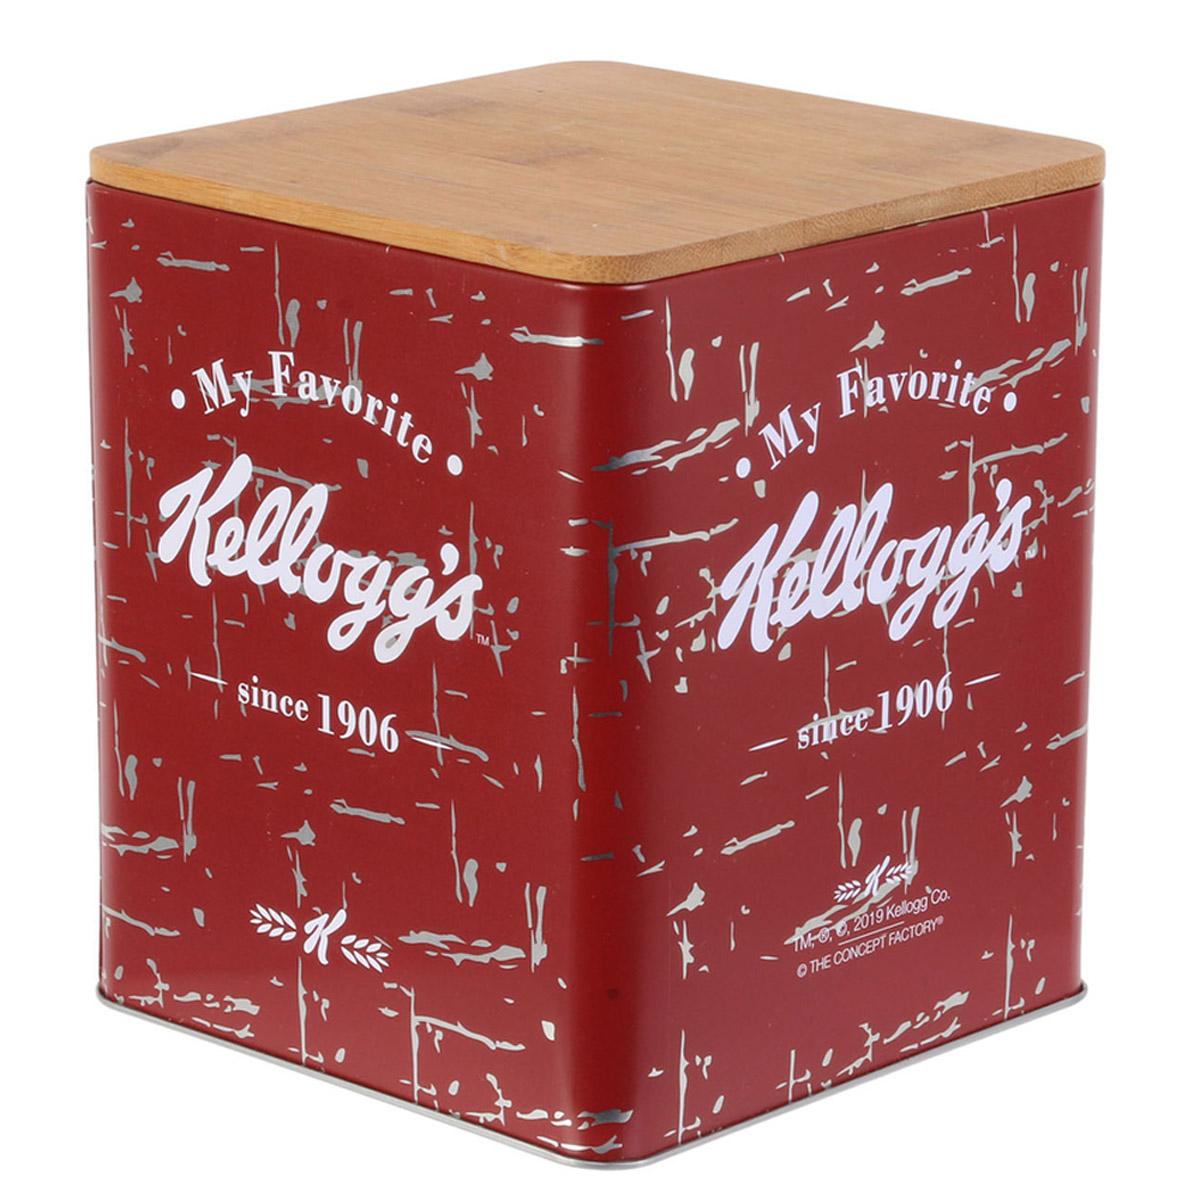 Boite métal bois \'Kellogg\'s\' rouge - 16x14x14 cm - [R2439]